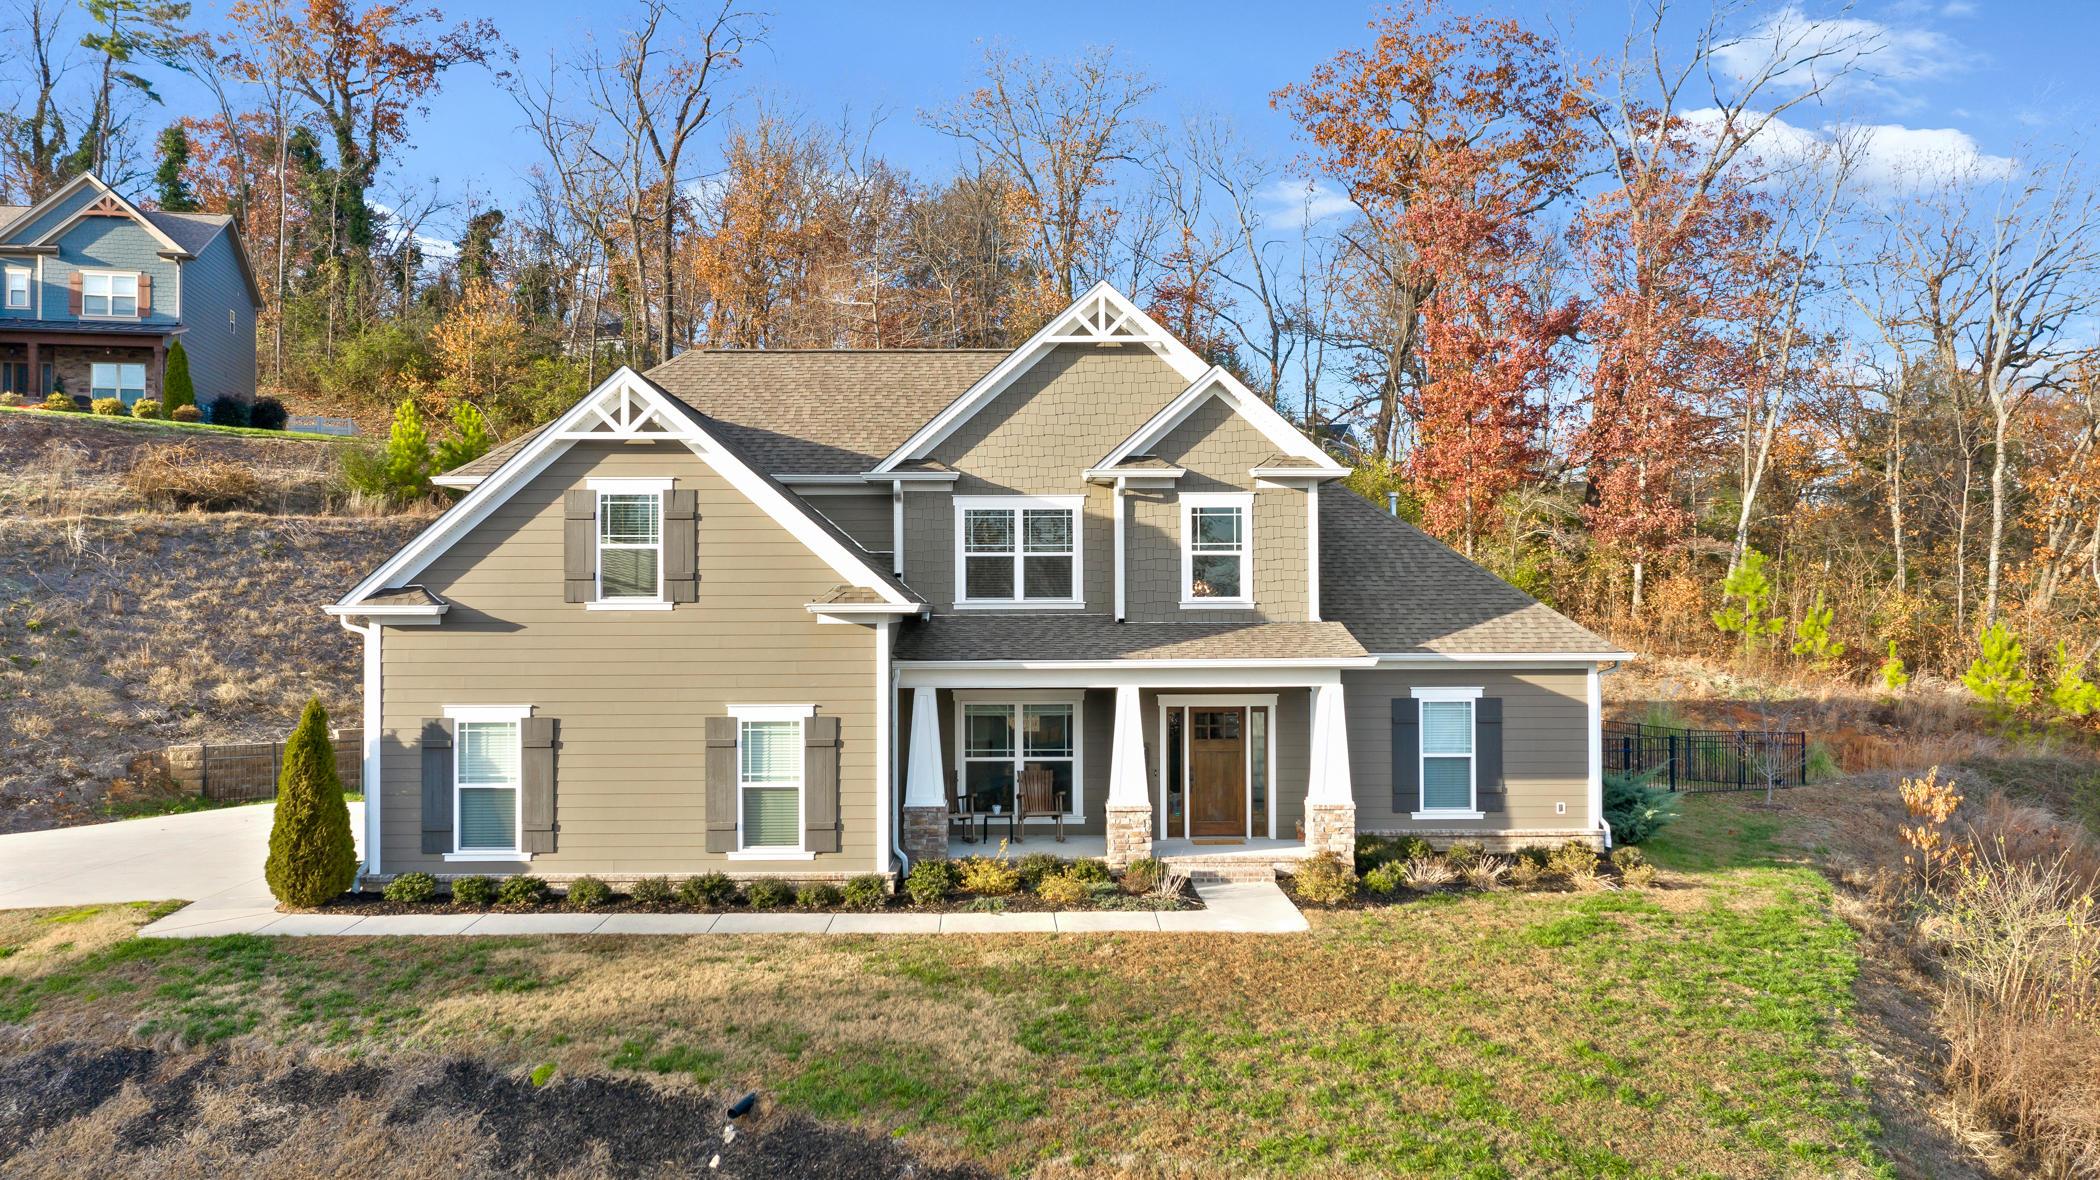 1347 Bridgeview Dr, Chattanooga, TN 37415